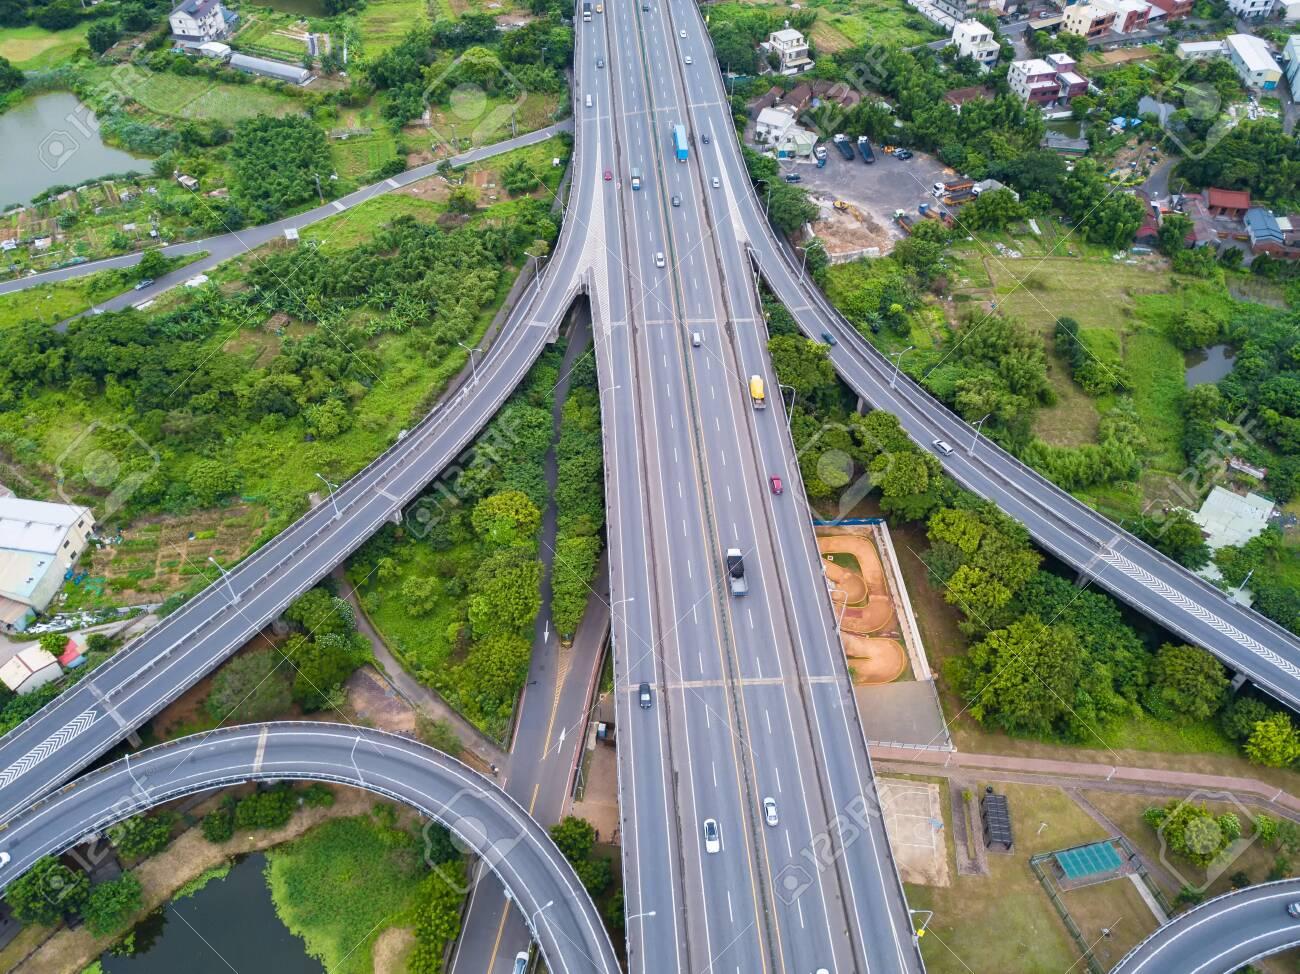 Aerial view of cars driving on highway junctions  Bridge roads